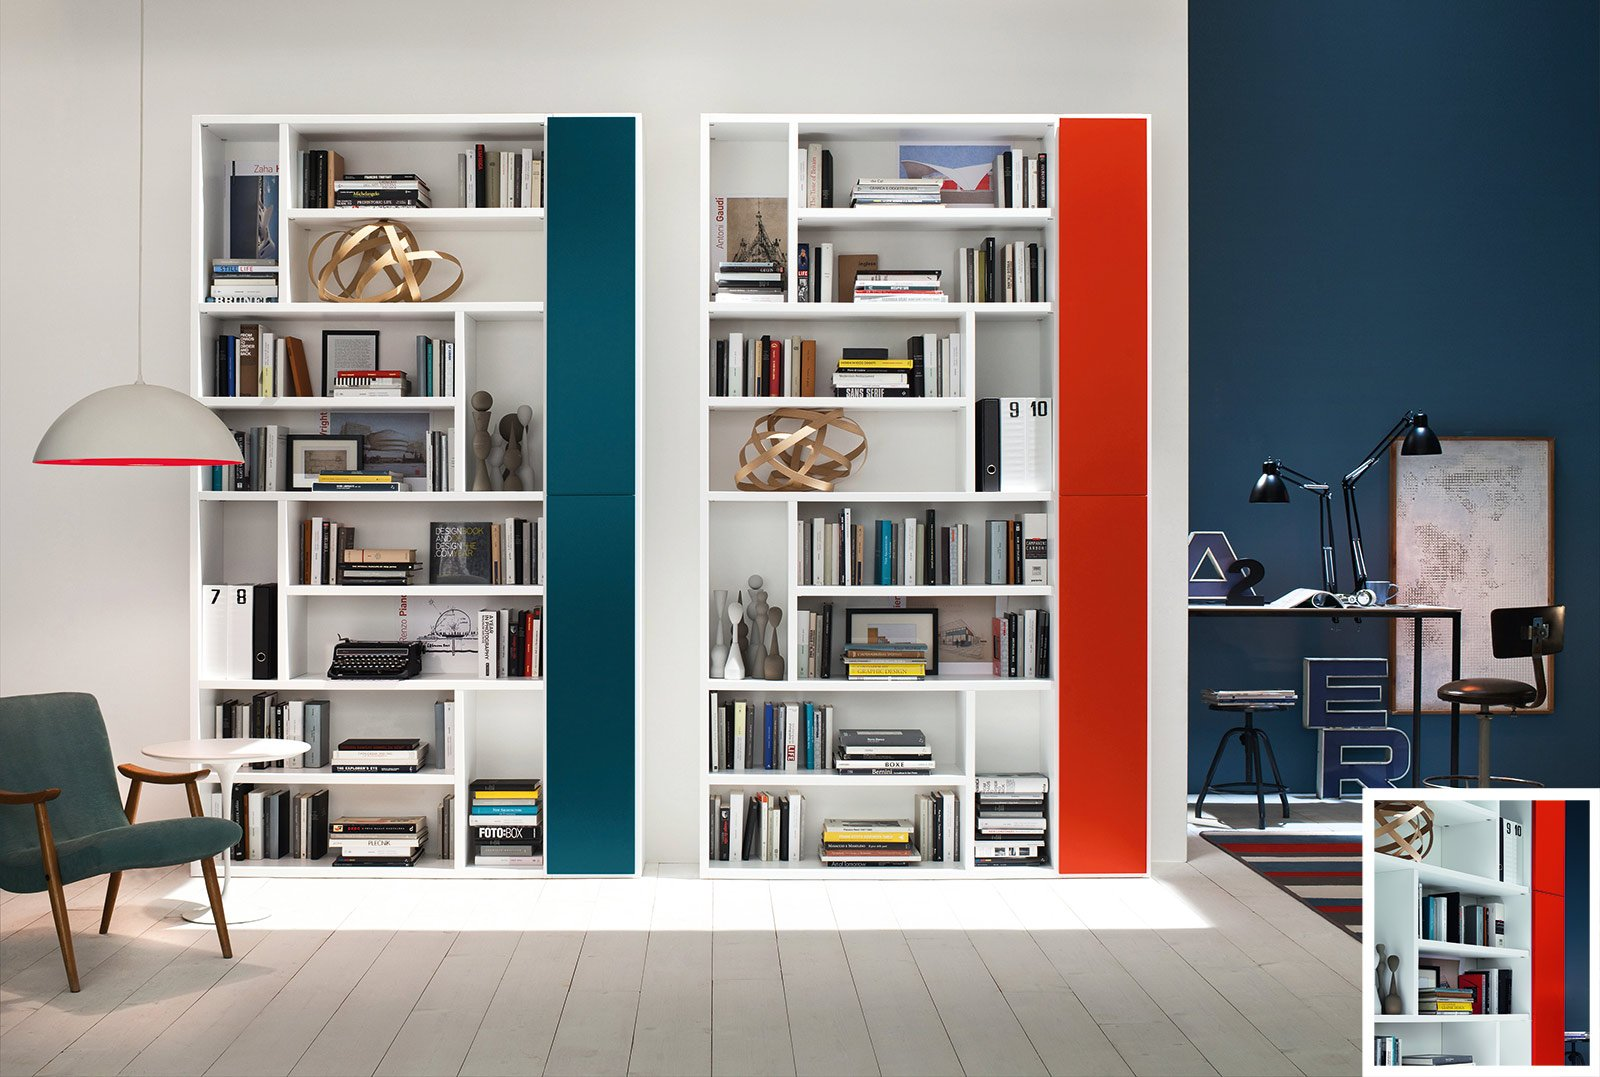 Libreria Cartongesso E Vetro librerie: grande o piccola? - cose di casa